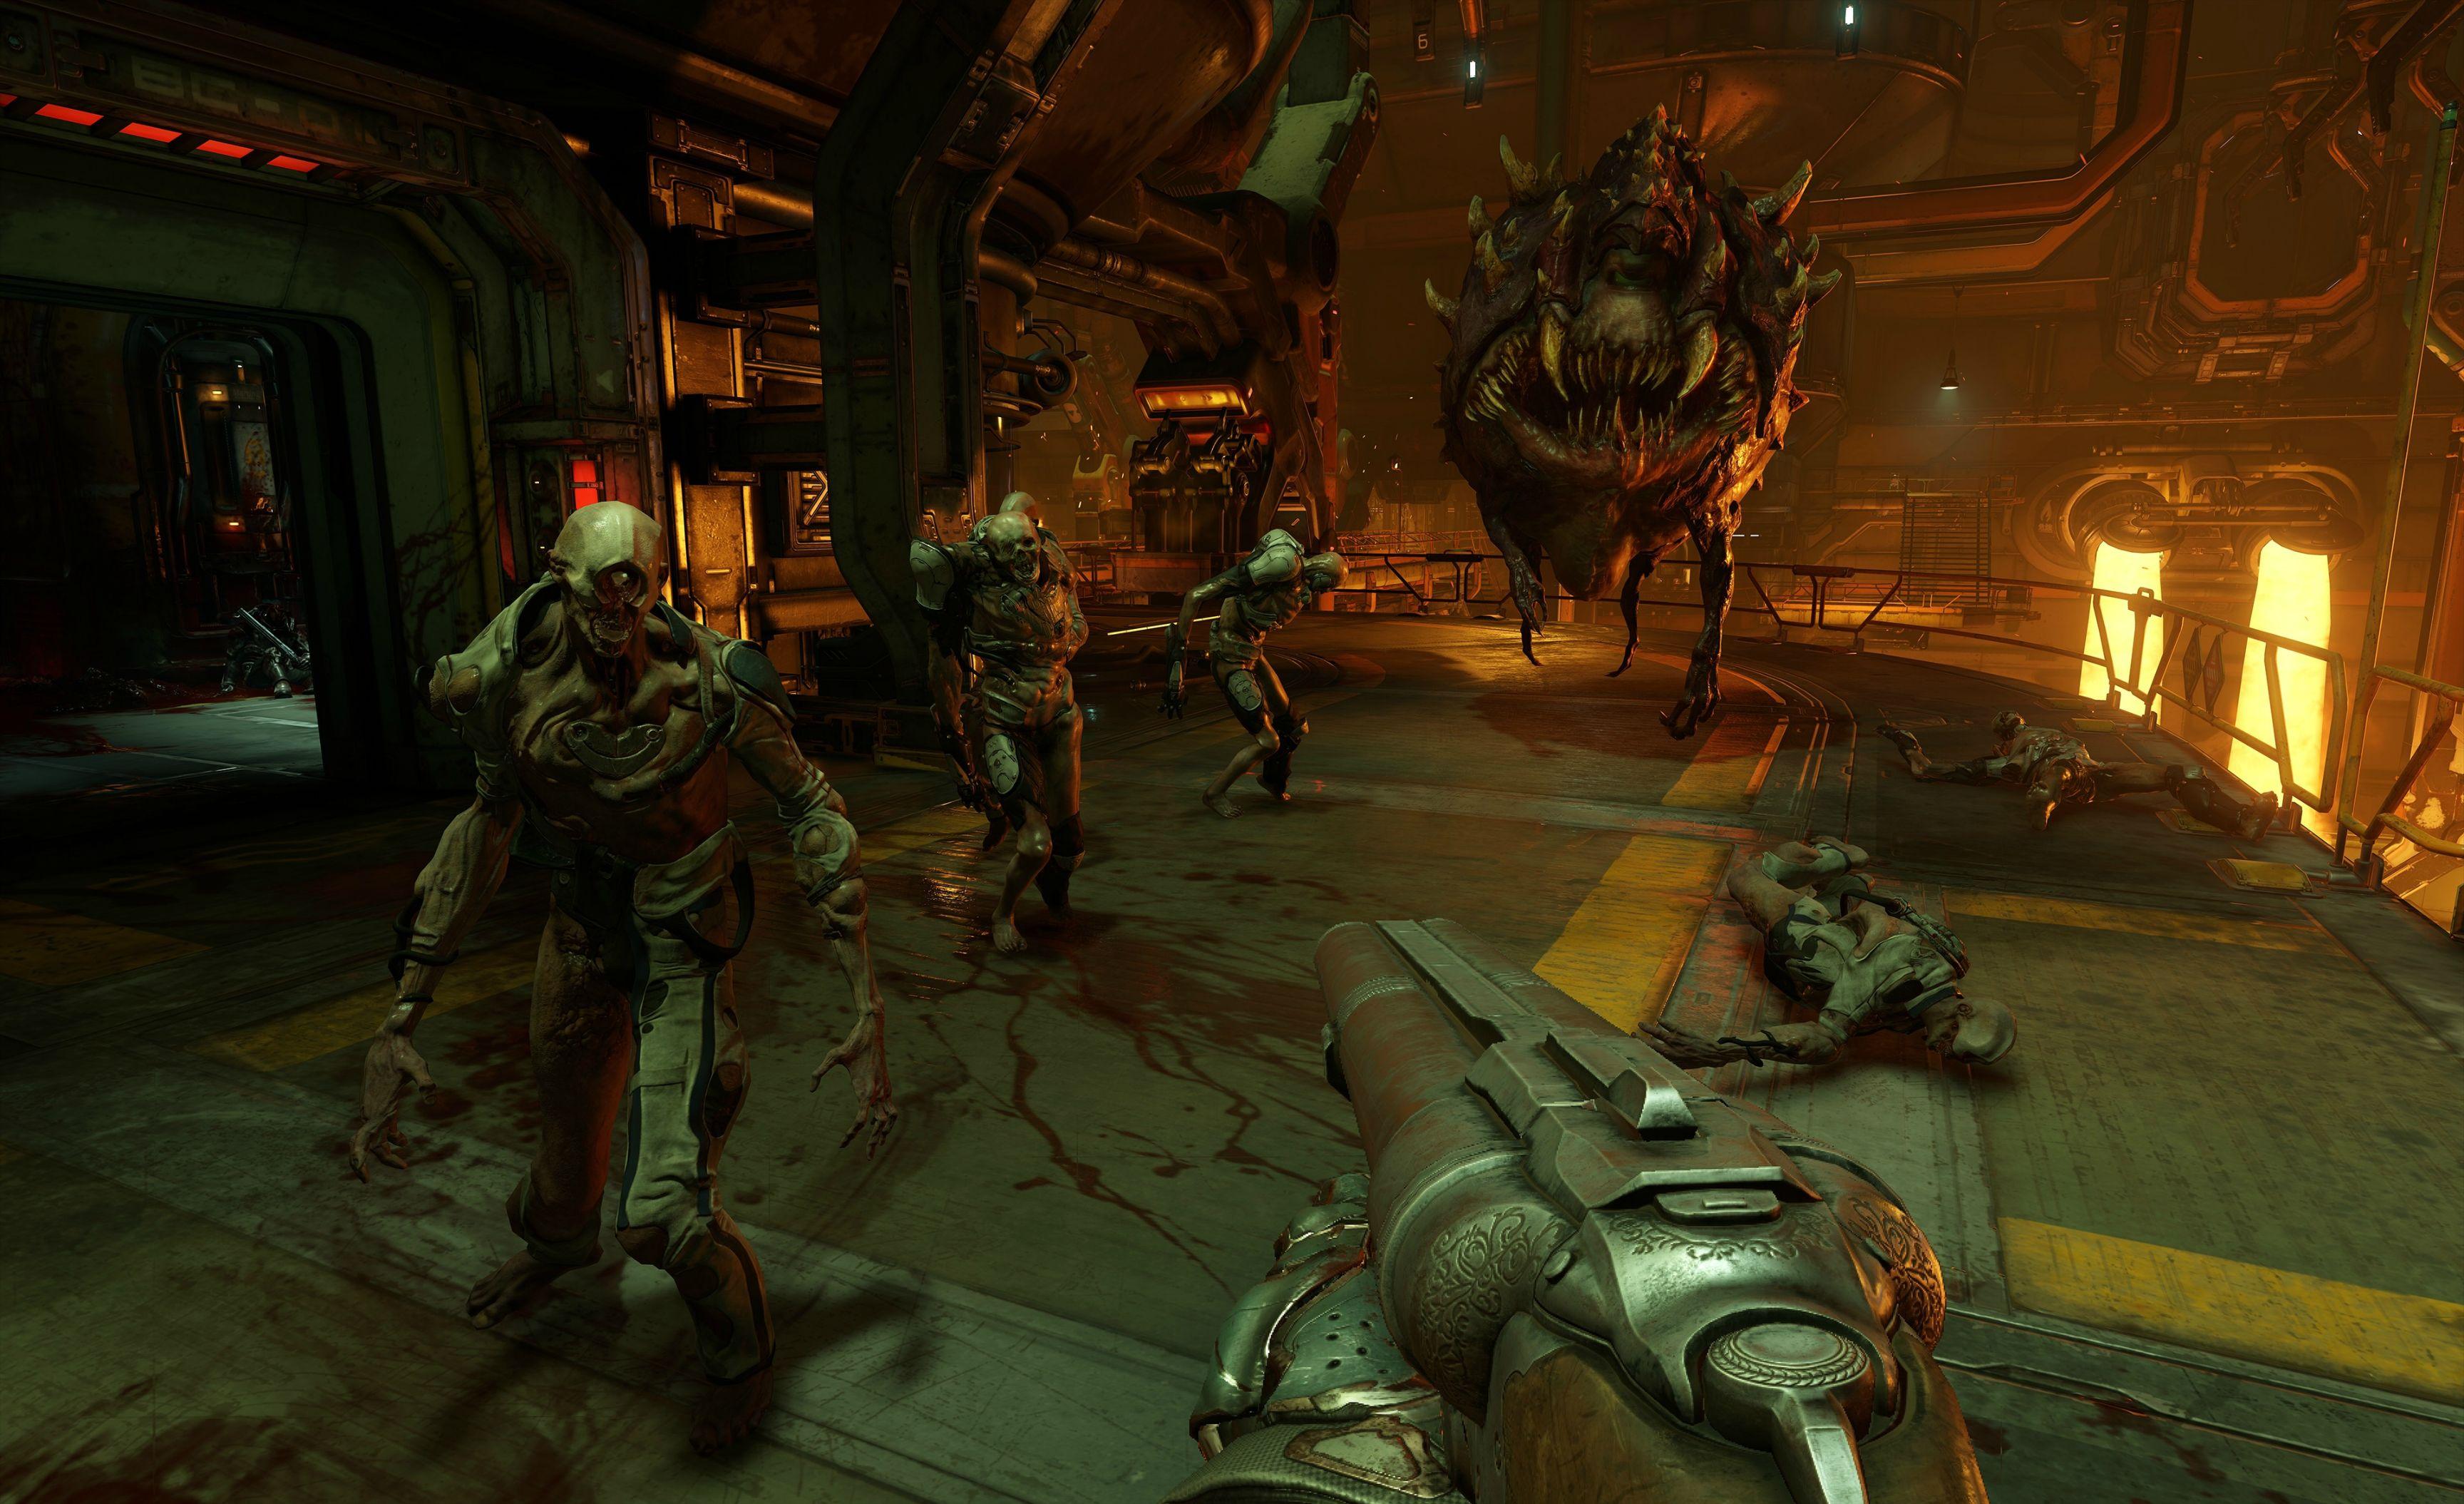 Nový Doom na jaře 2016 s brokovnicí, motorovkou a brutalitou 110125